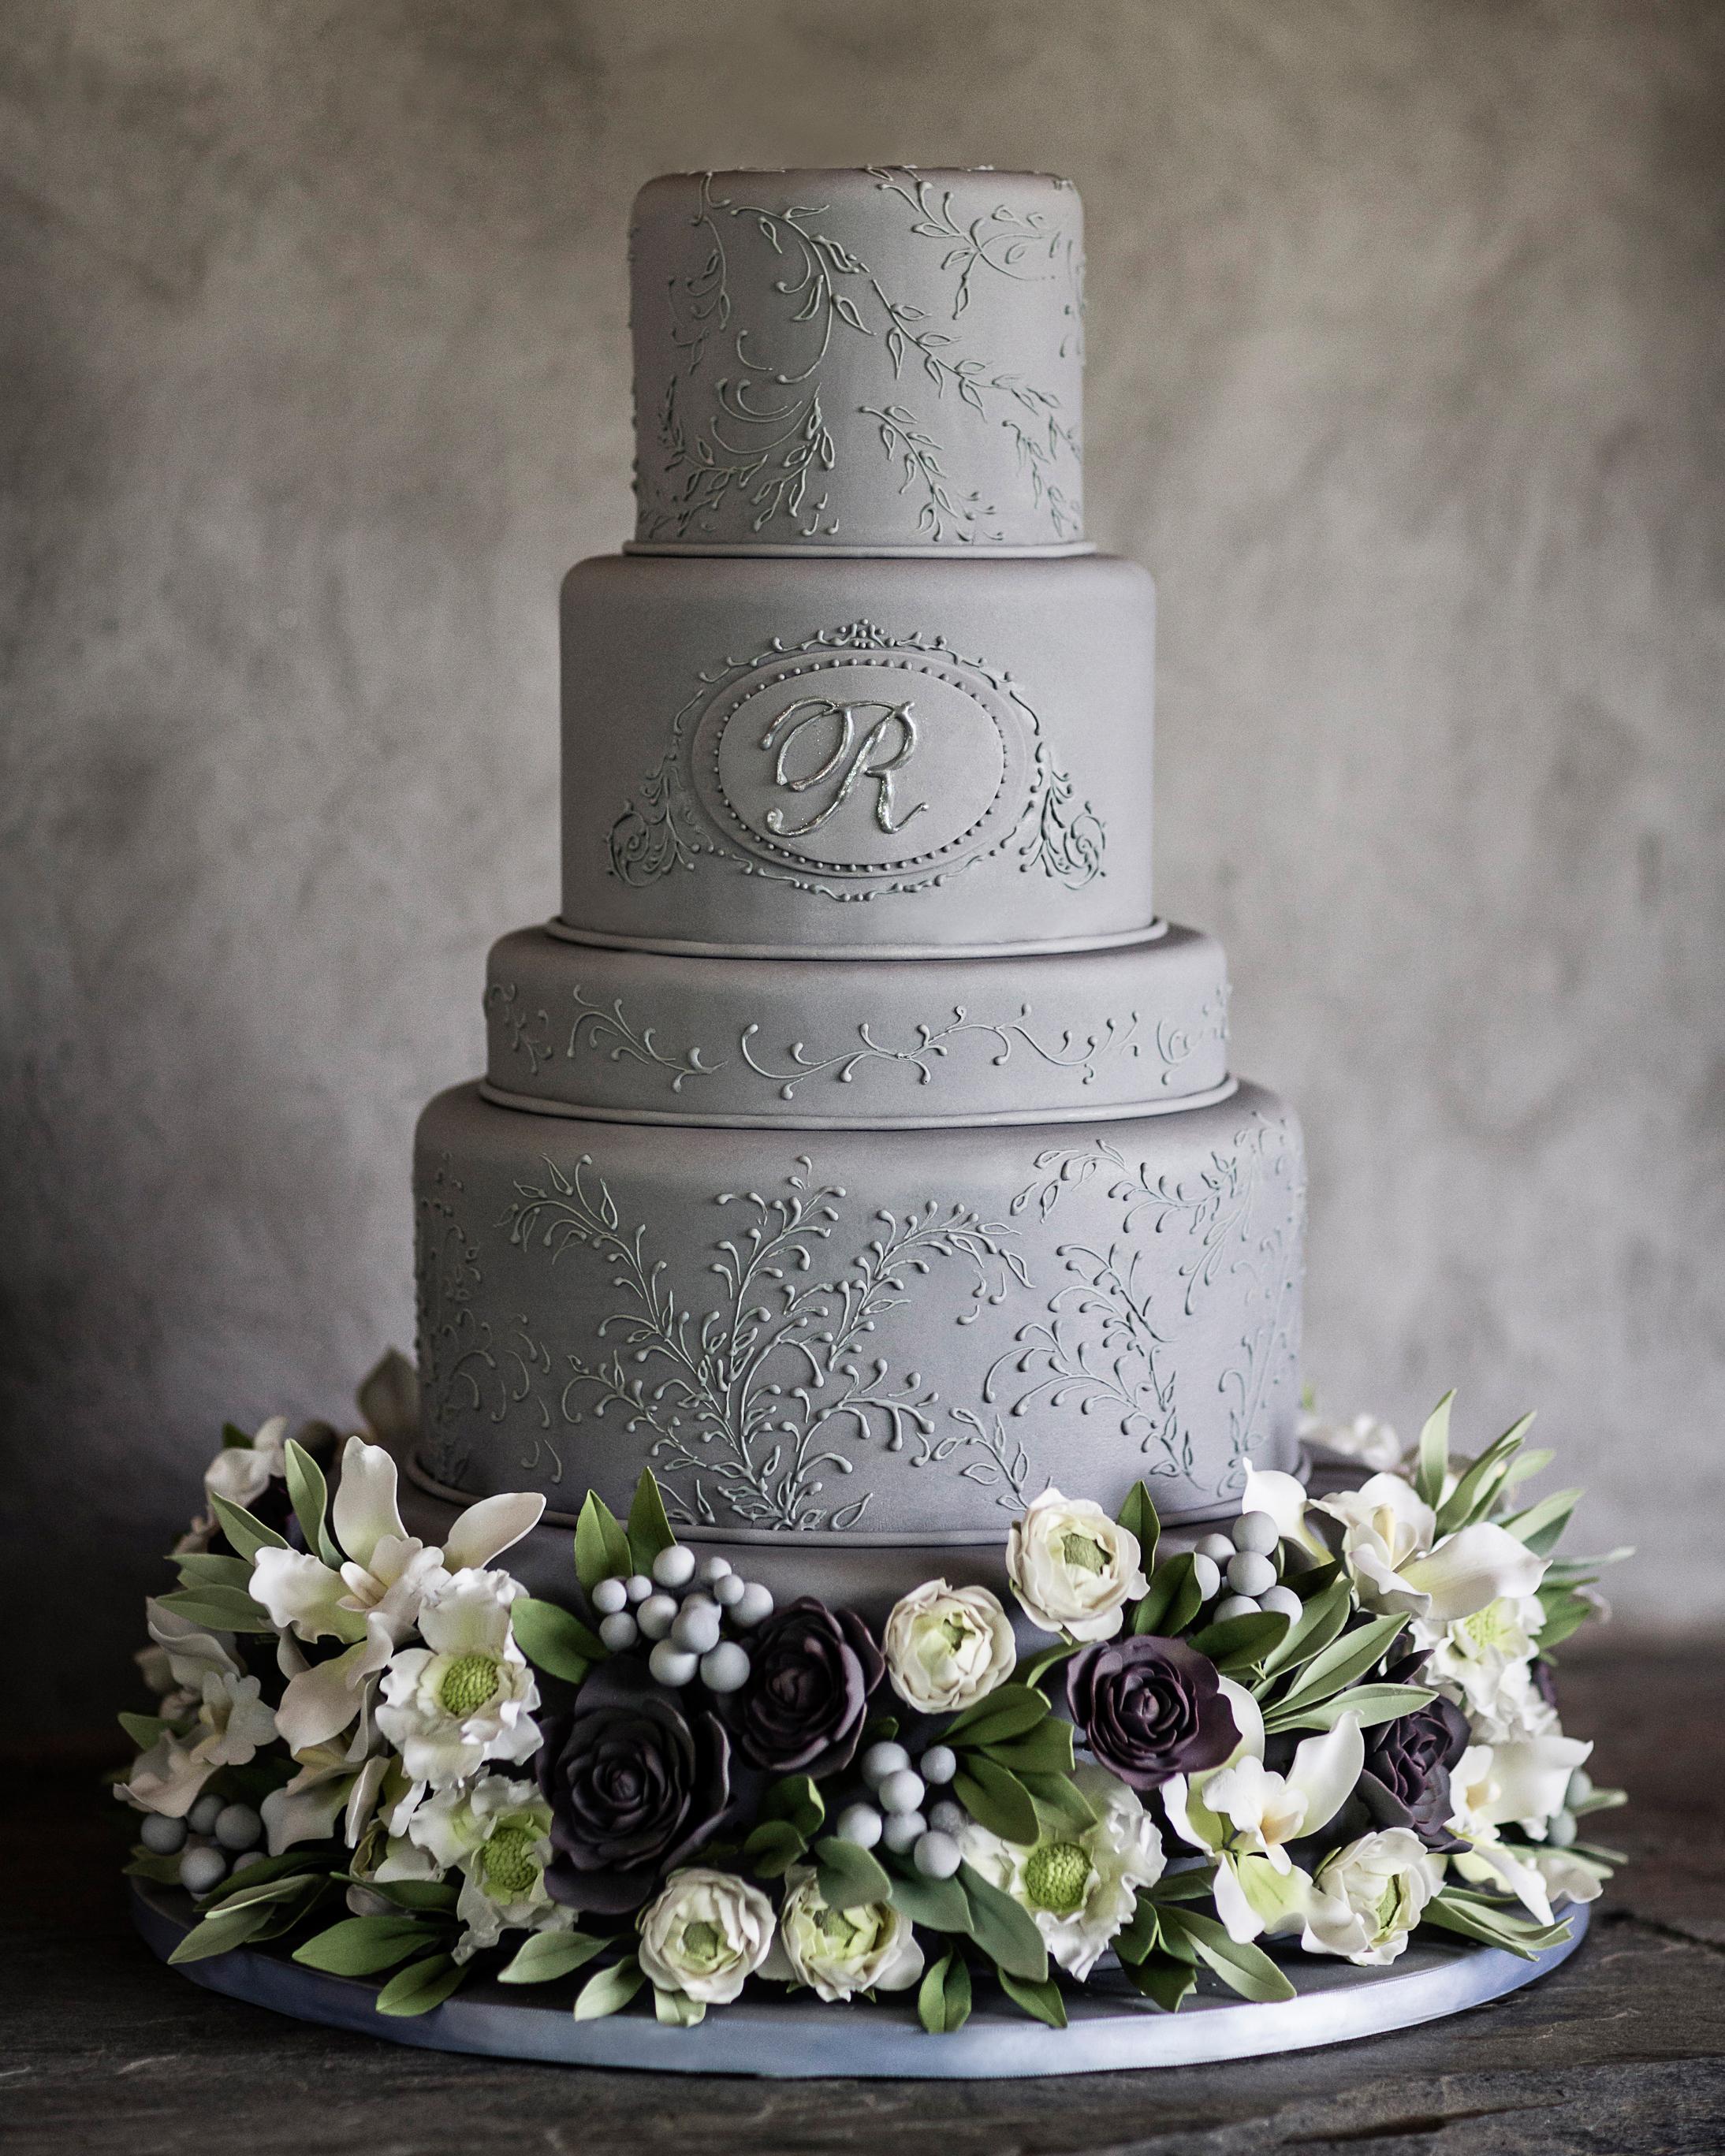 cake-pros-anaparzychcake-0414.jpg